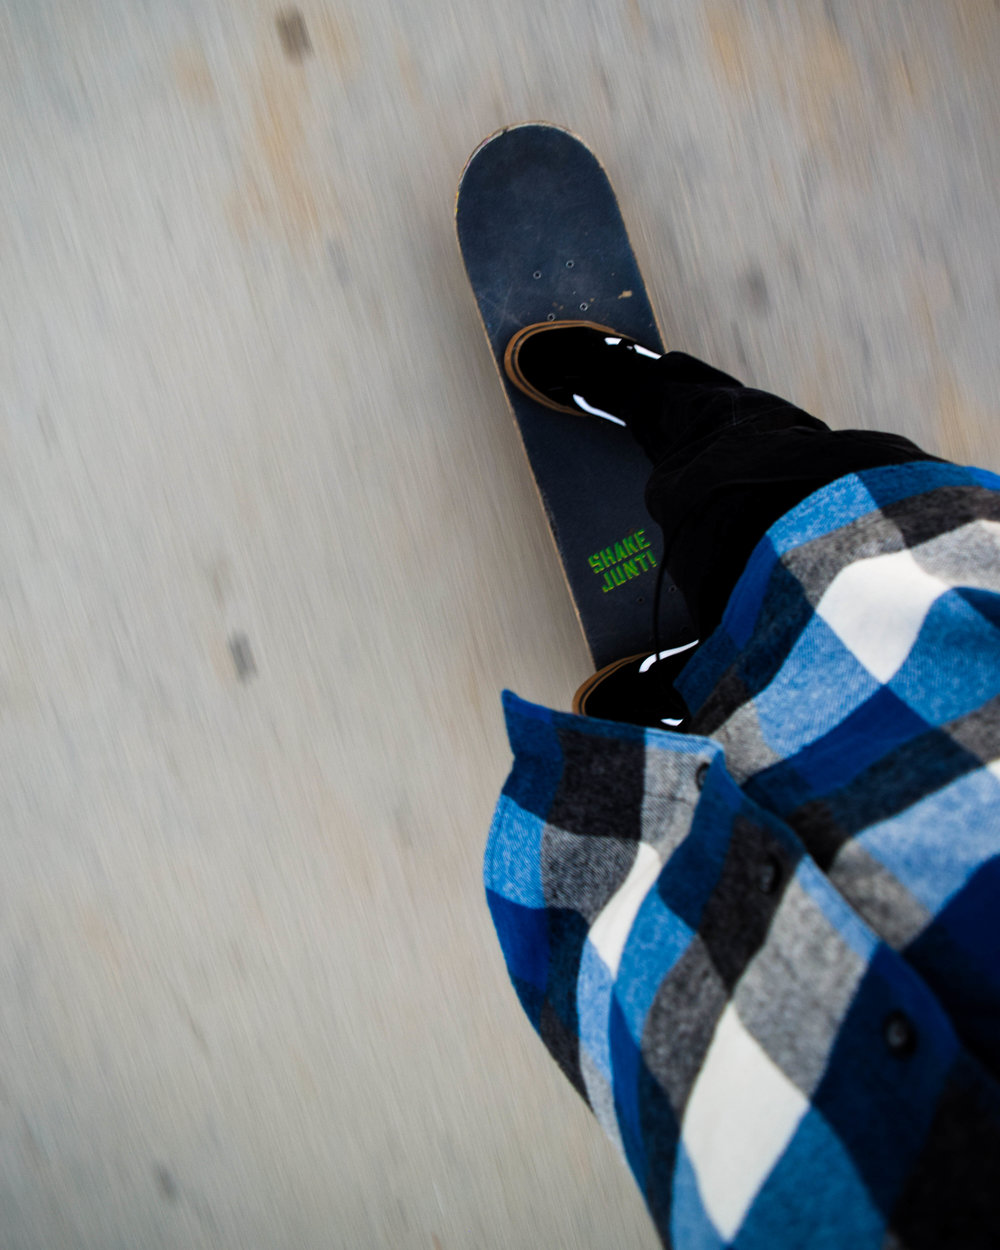 self-skateboard 001.jpg